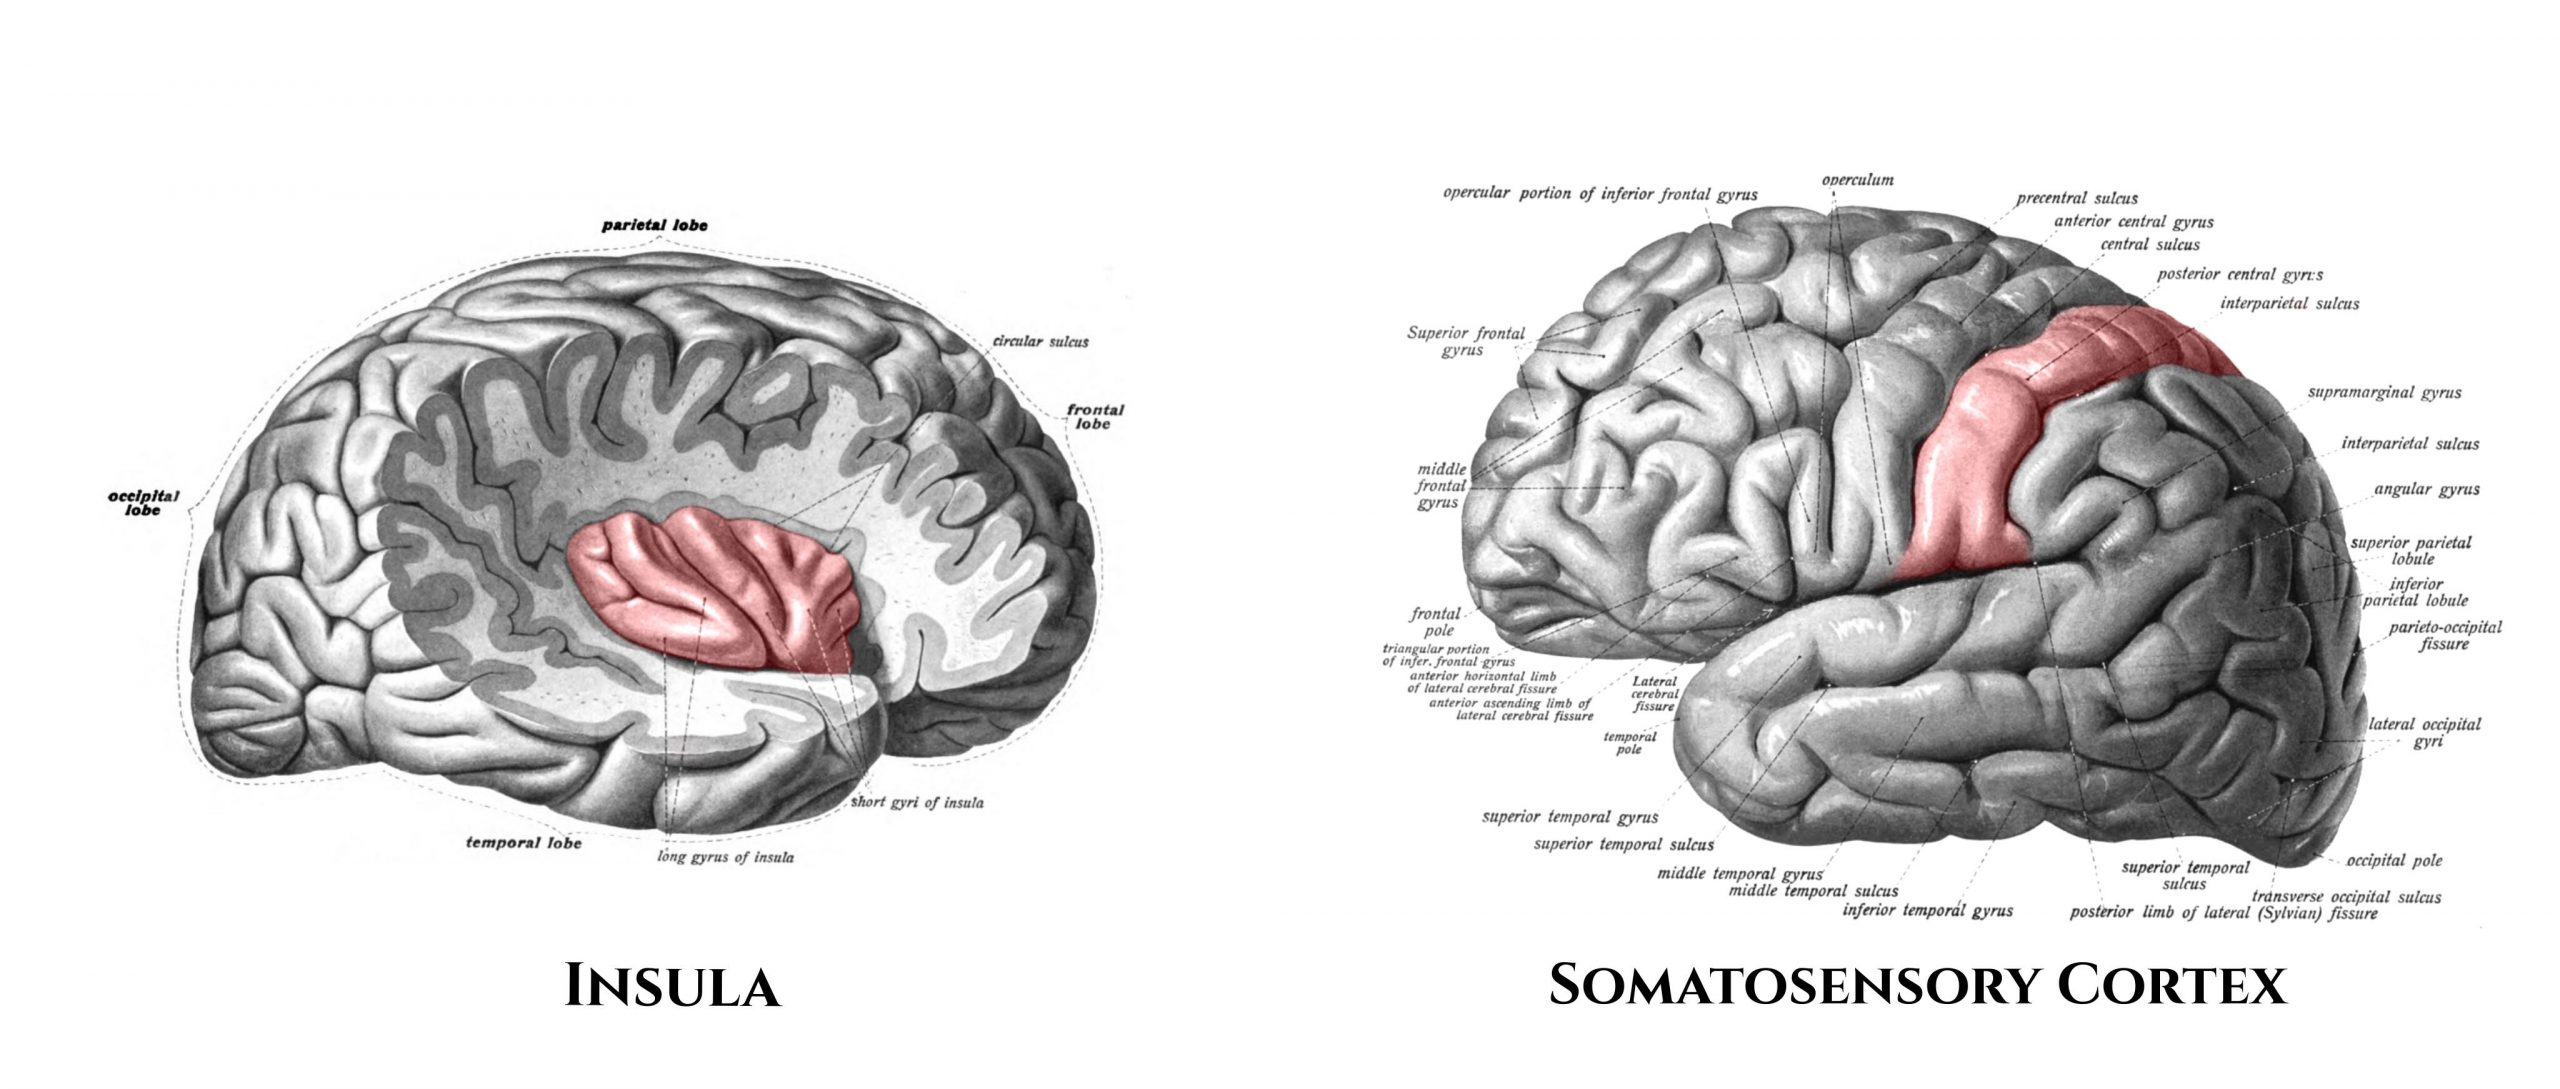 Insula and Somatosensory Cortex